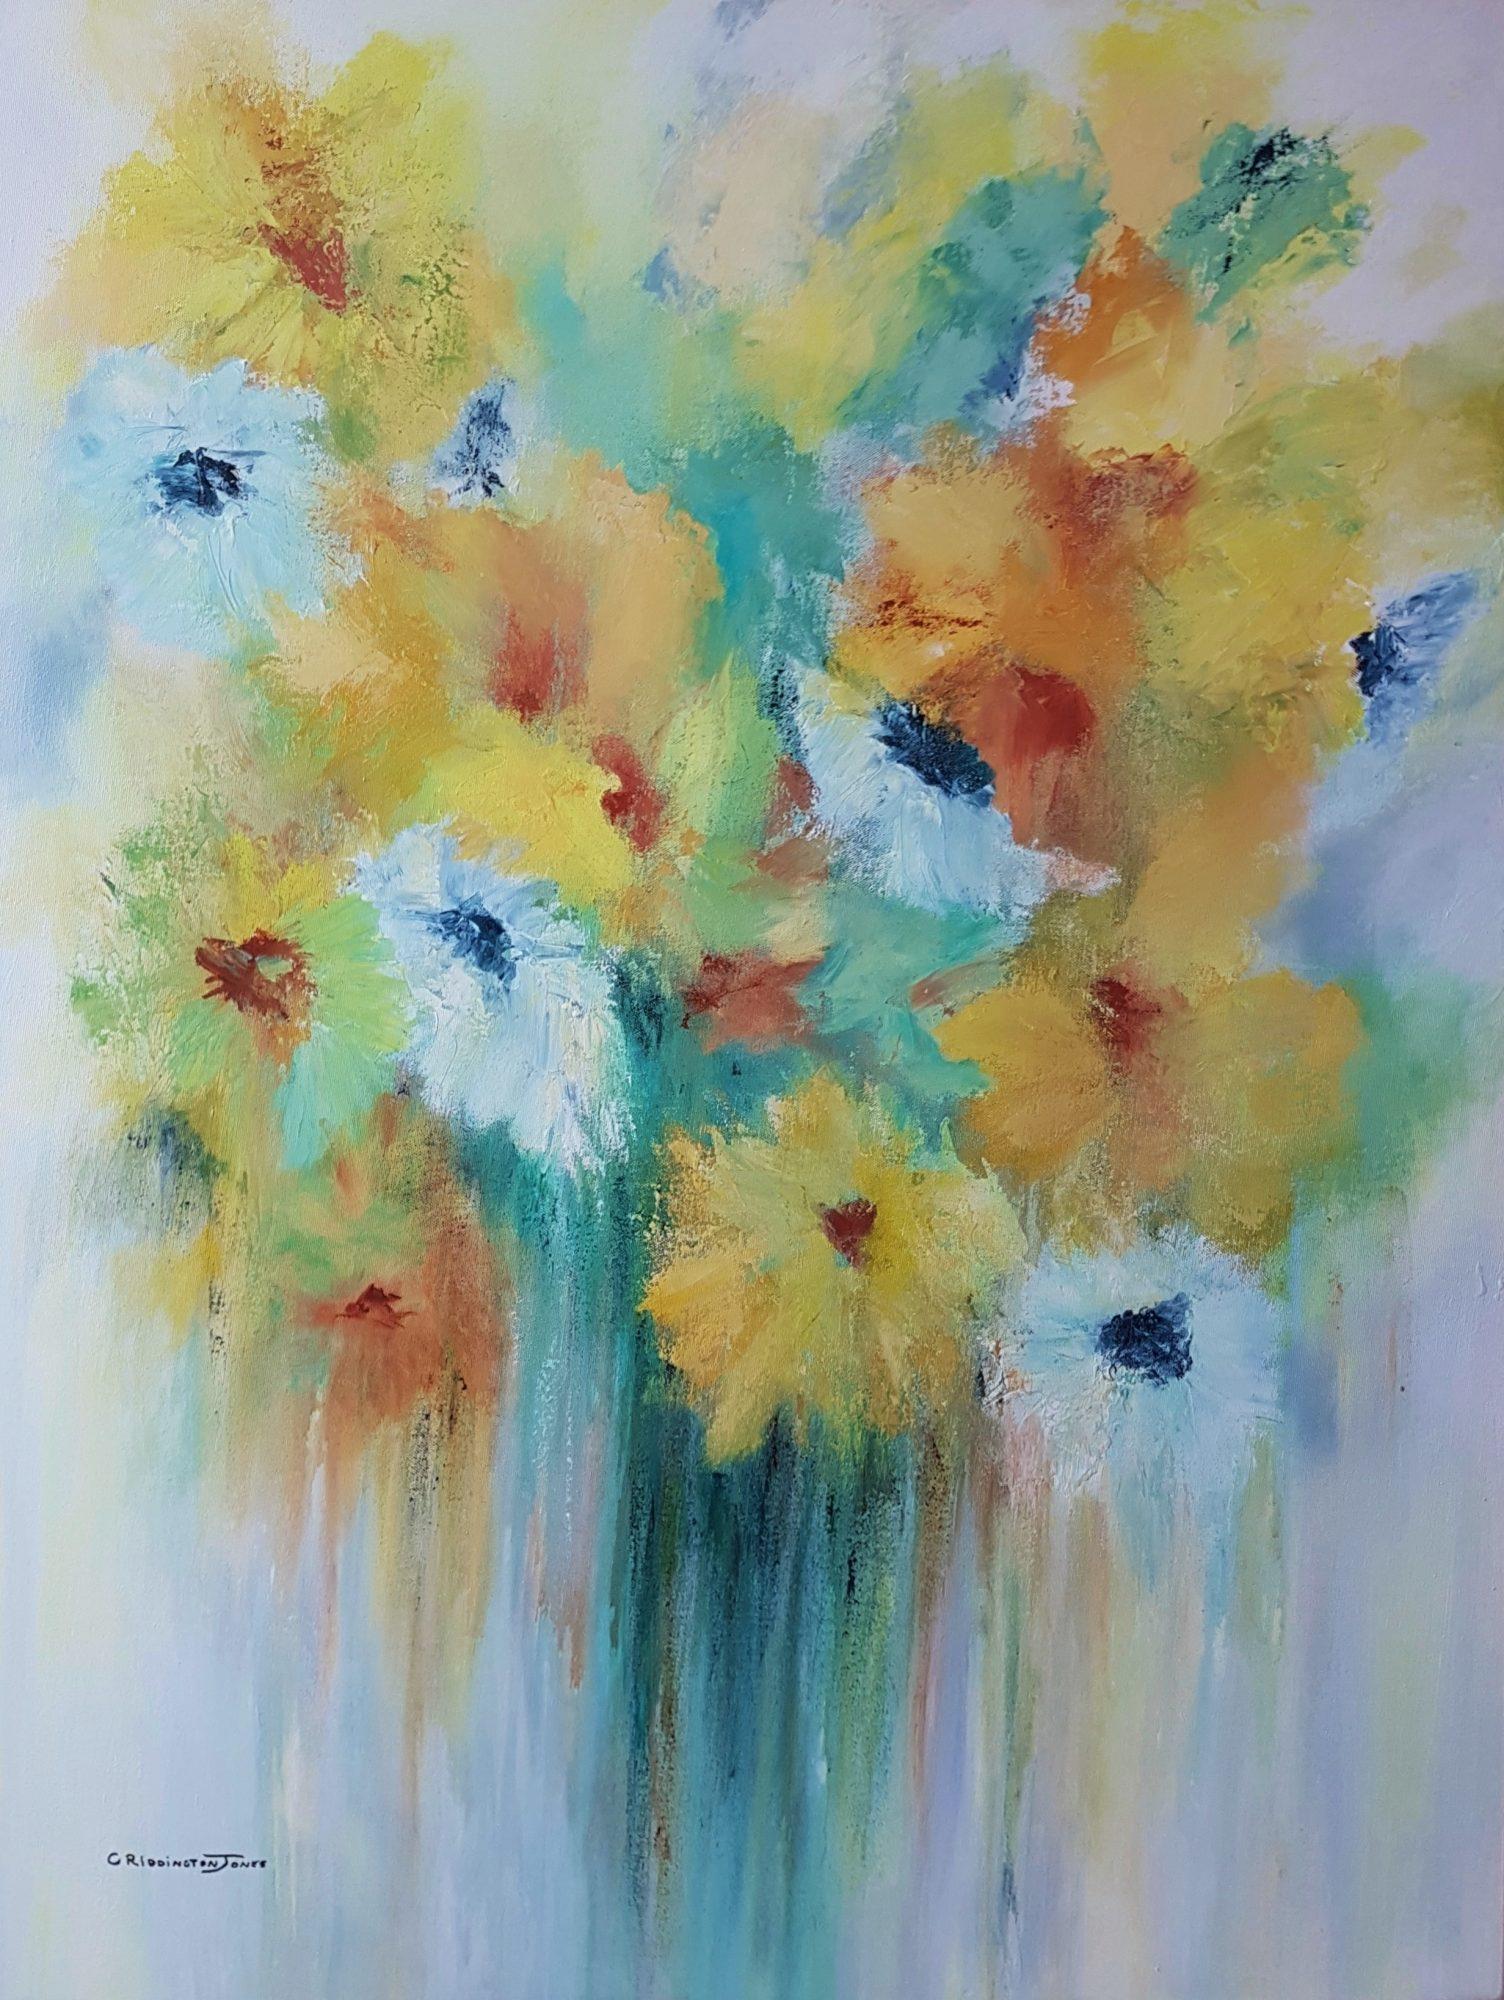 A Gathering of Blooms, 76cm x 1M, Clare Riddington Jones